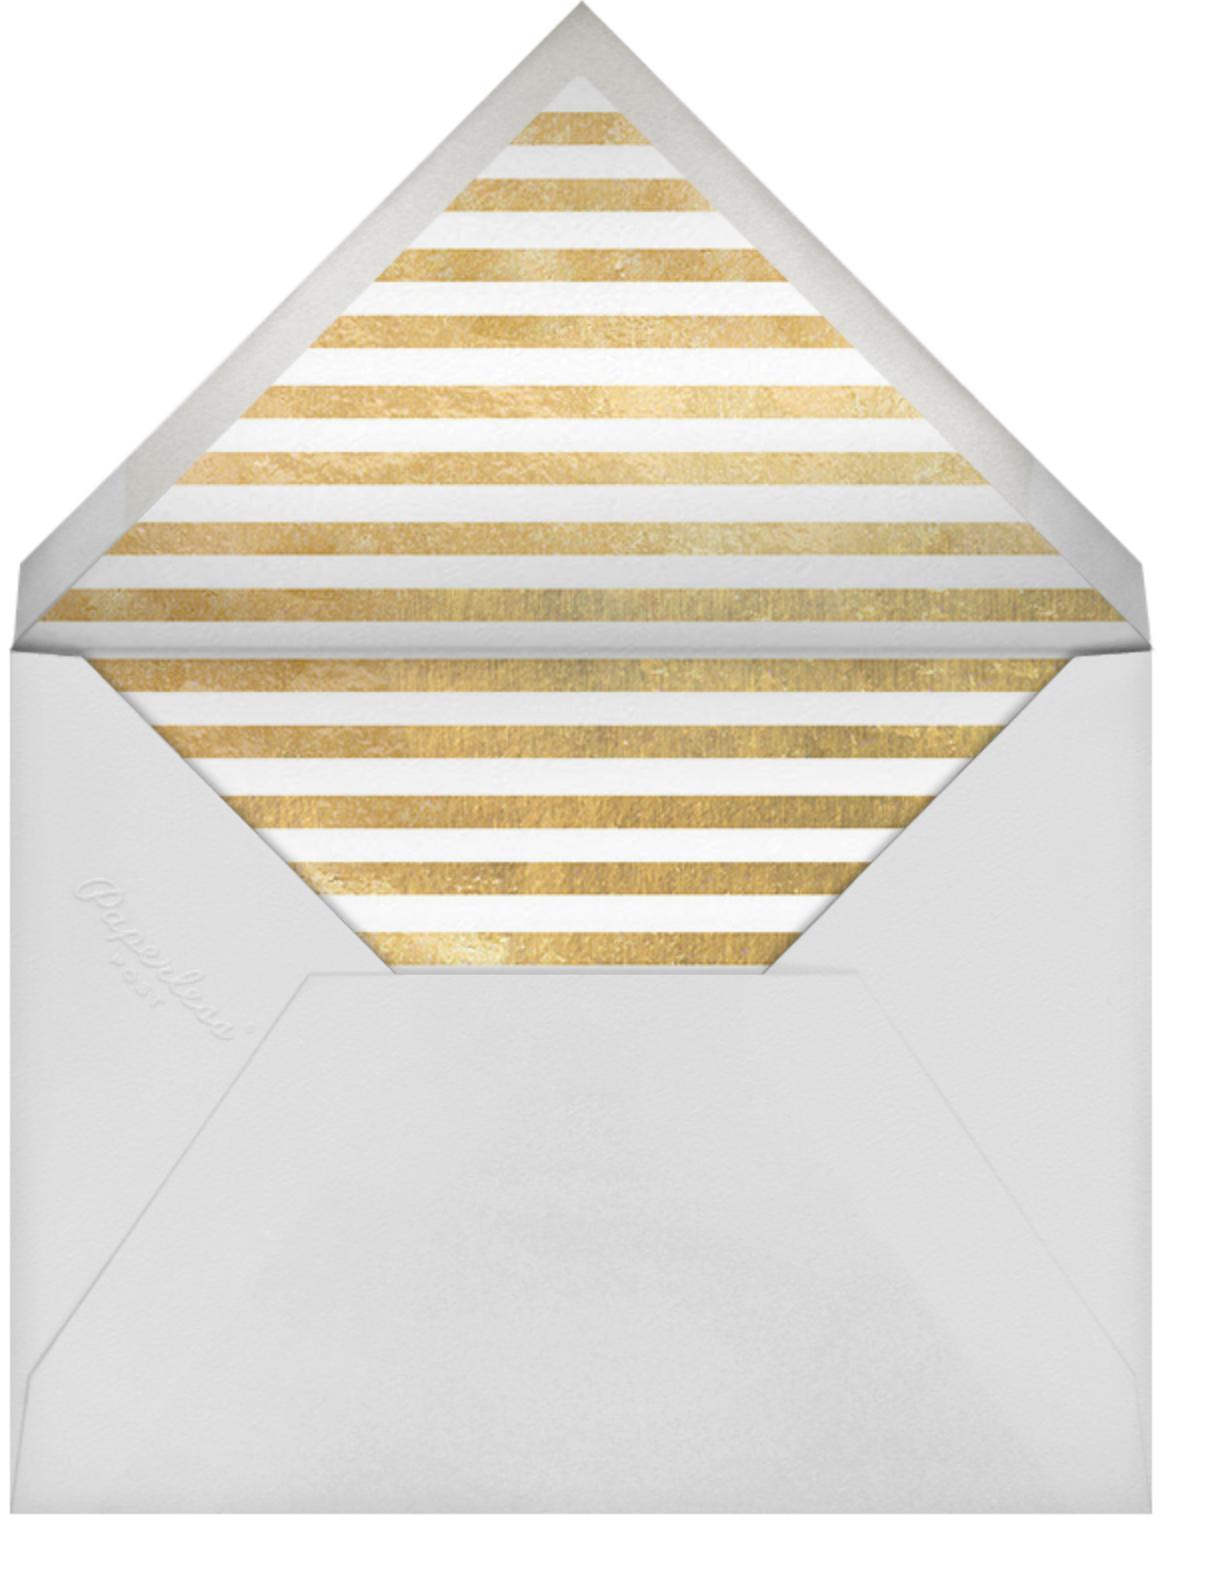 Evergreen Stripes - Gold/White - kate spade new york - Engagement party - envelope back